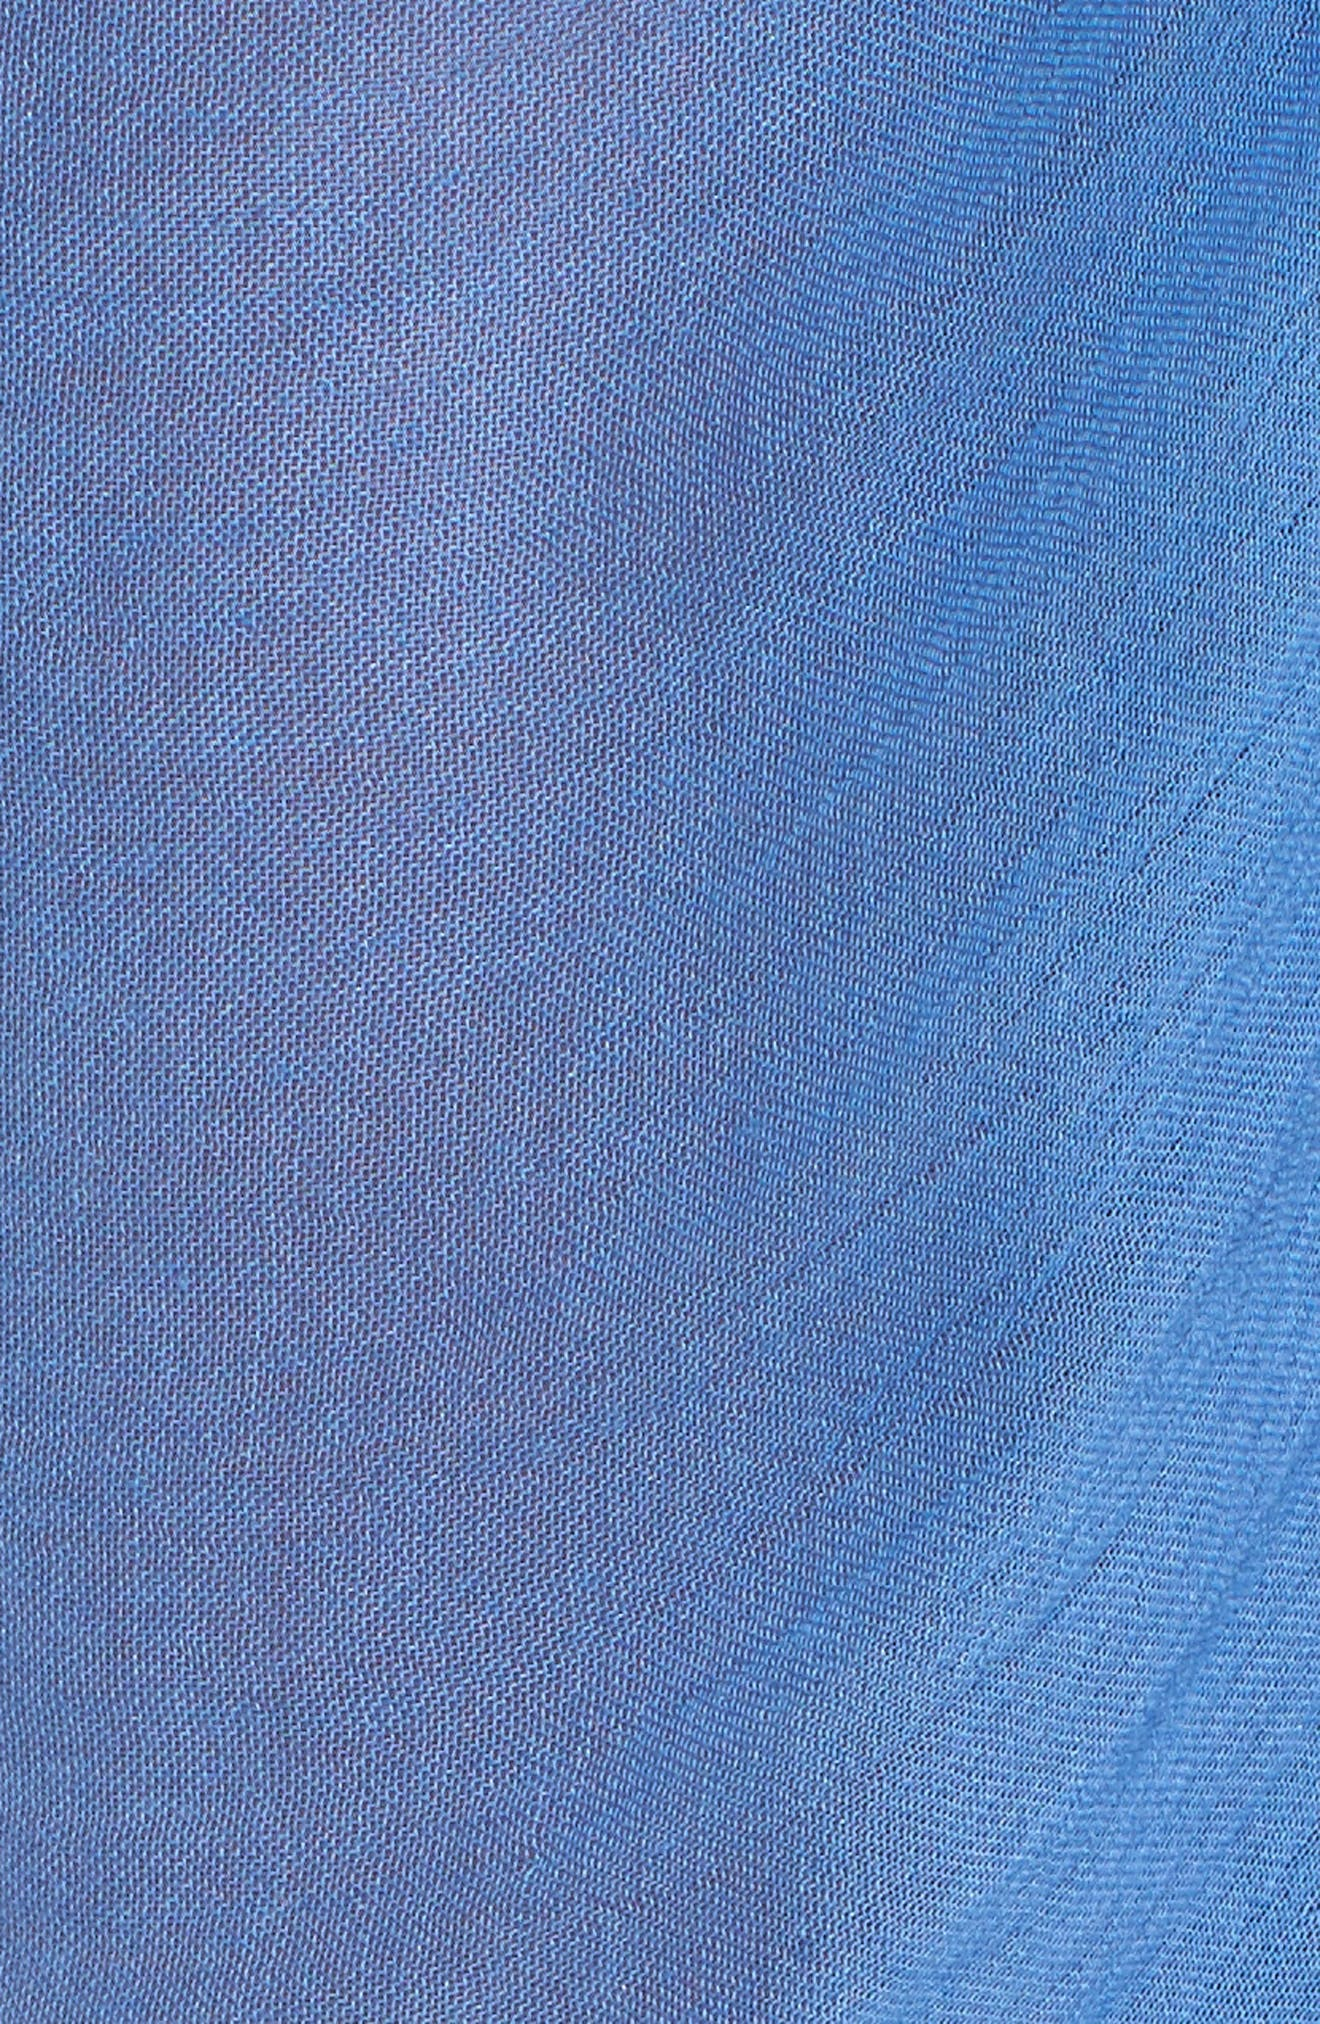 Pom Pom Pareo,                             Alternate thumbnail 4, color,                             Coastal Blue